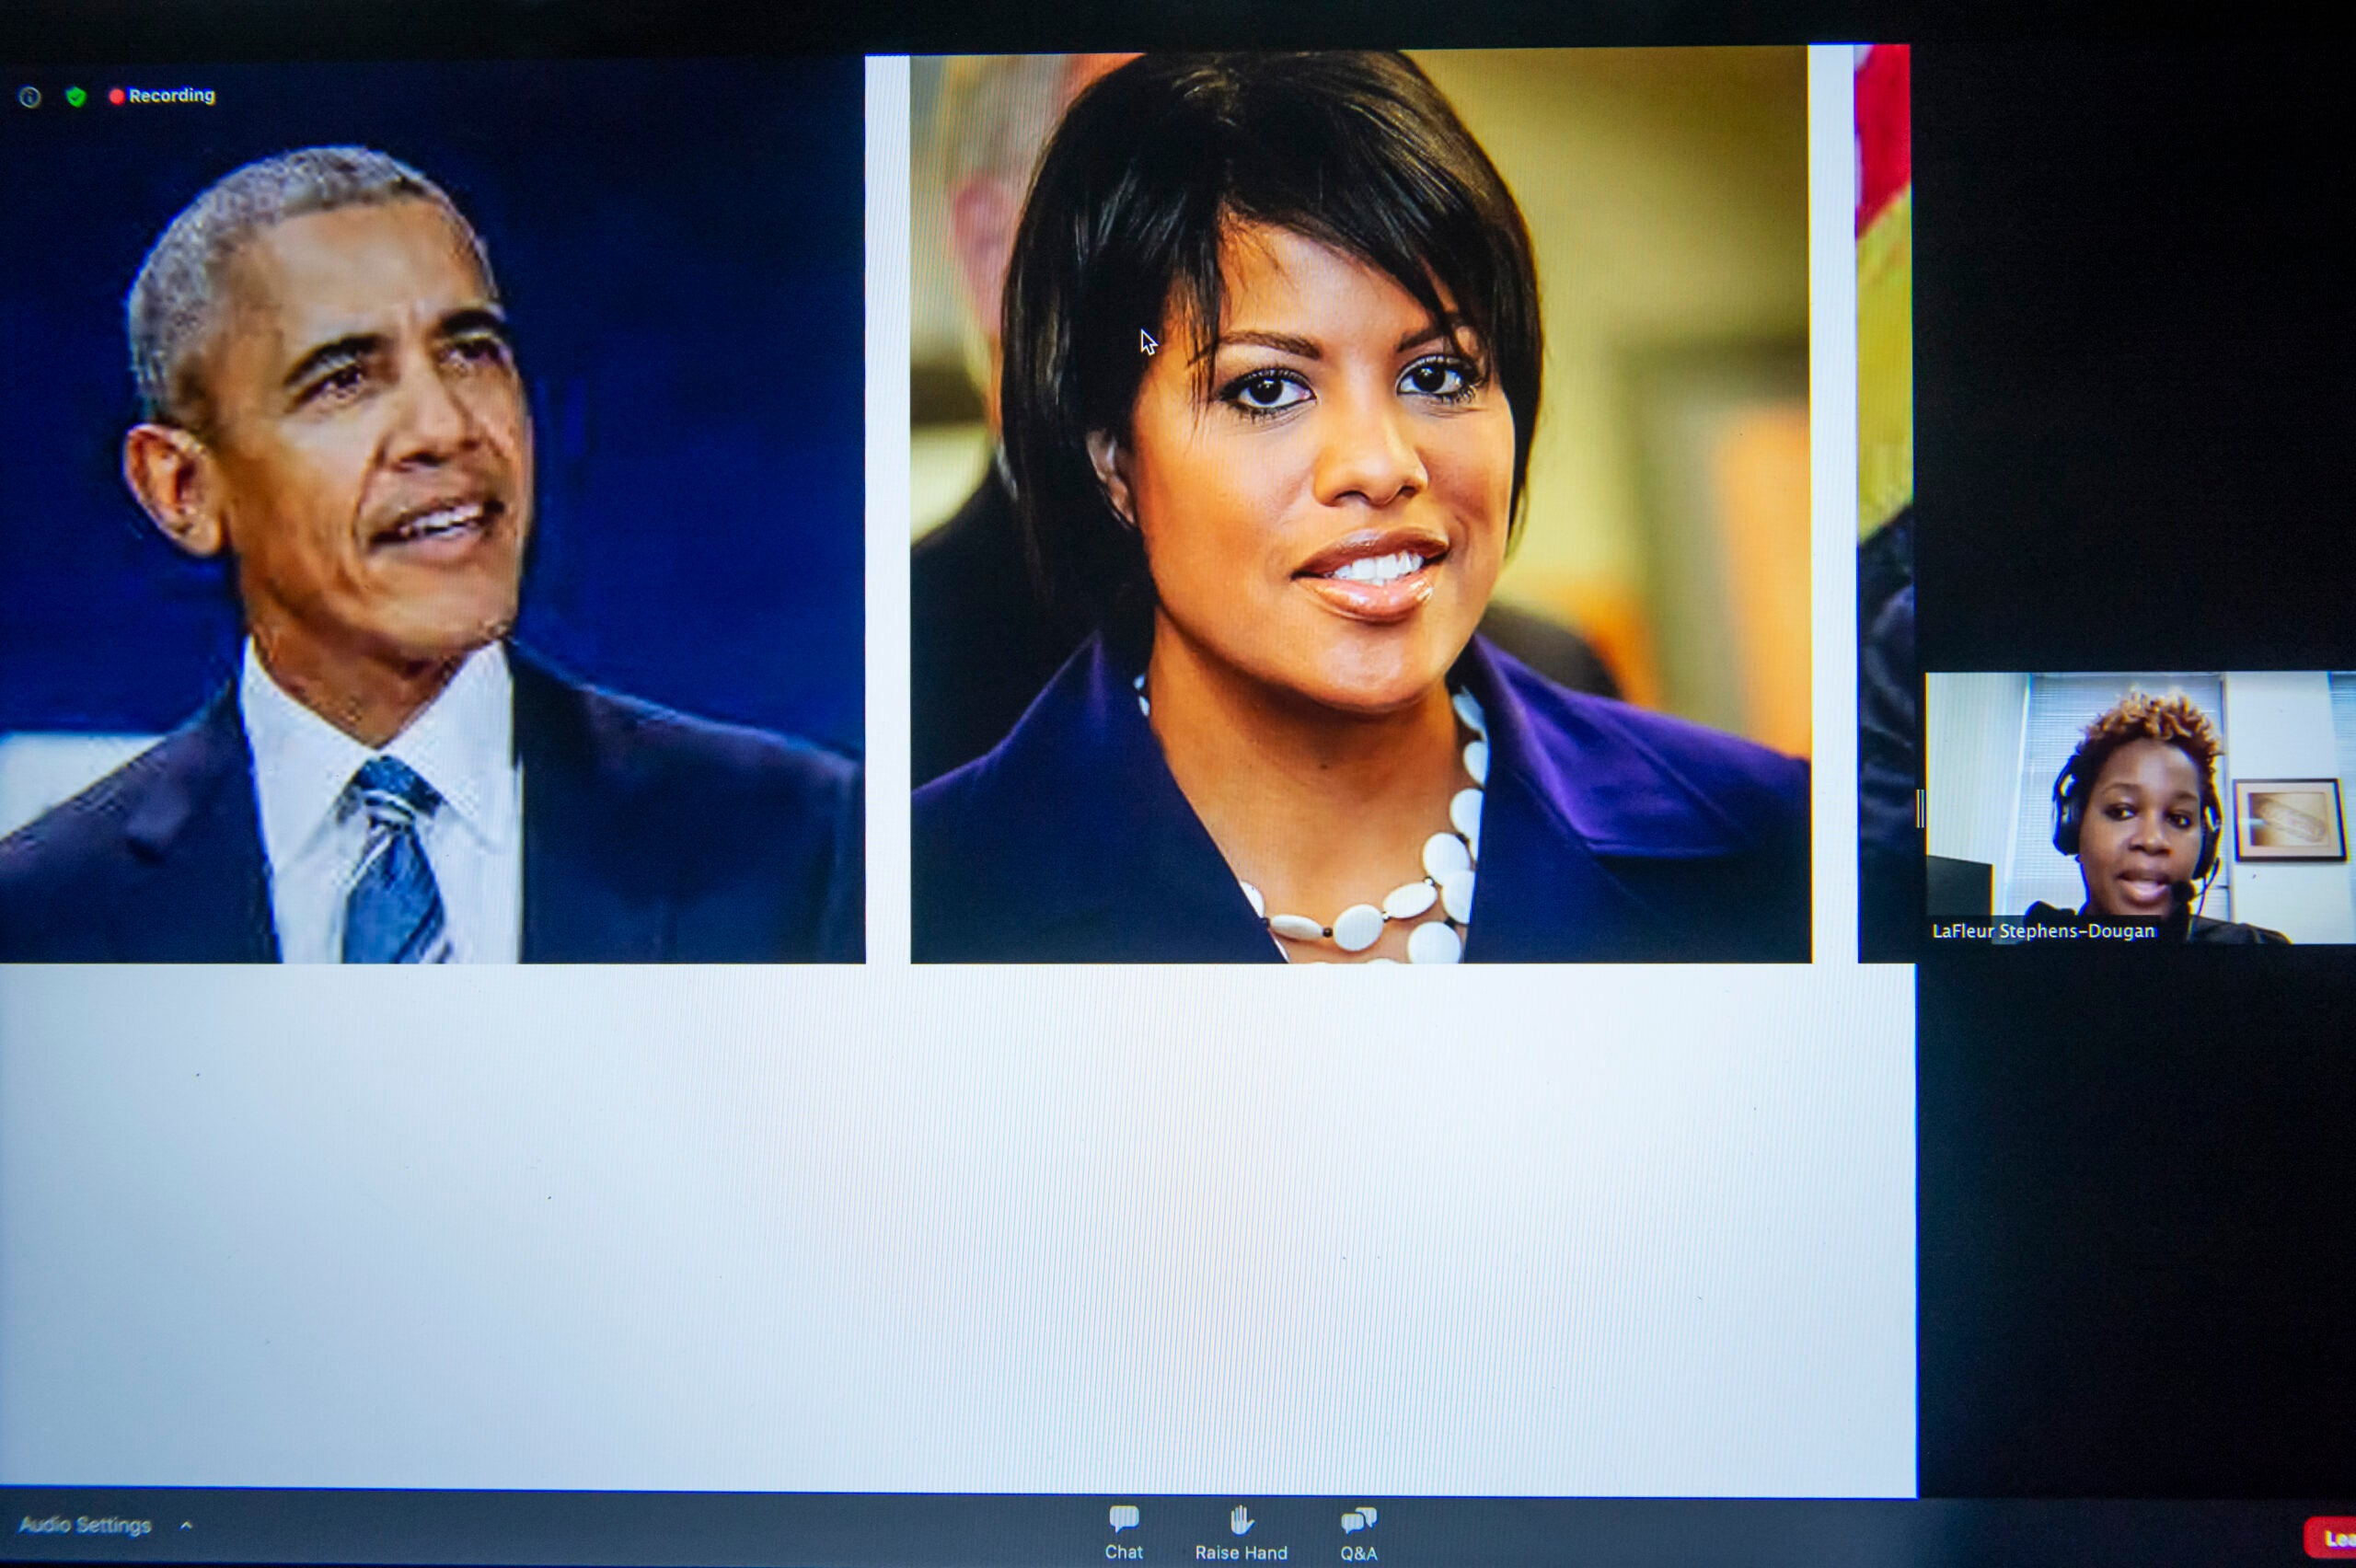 President Obama and Baltimore Mayor Stephanie Rawlings-Blake.